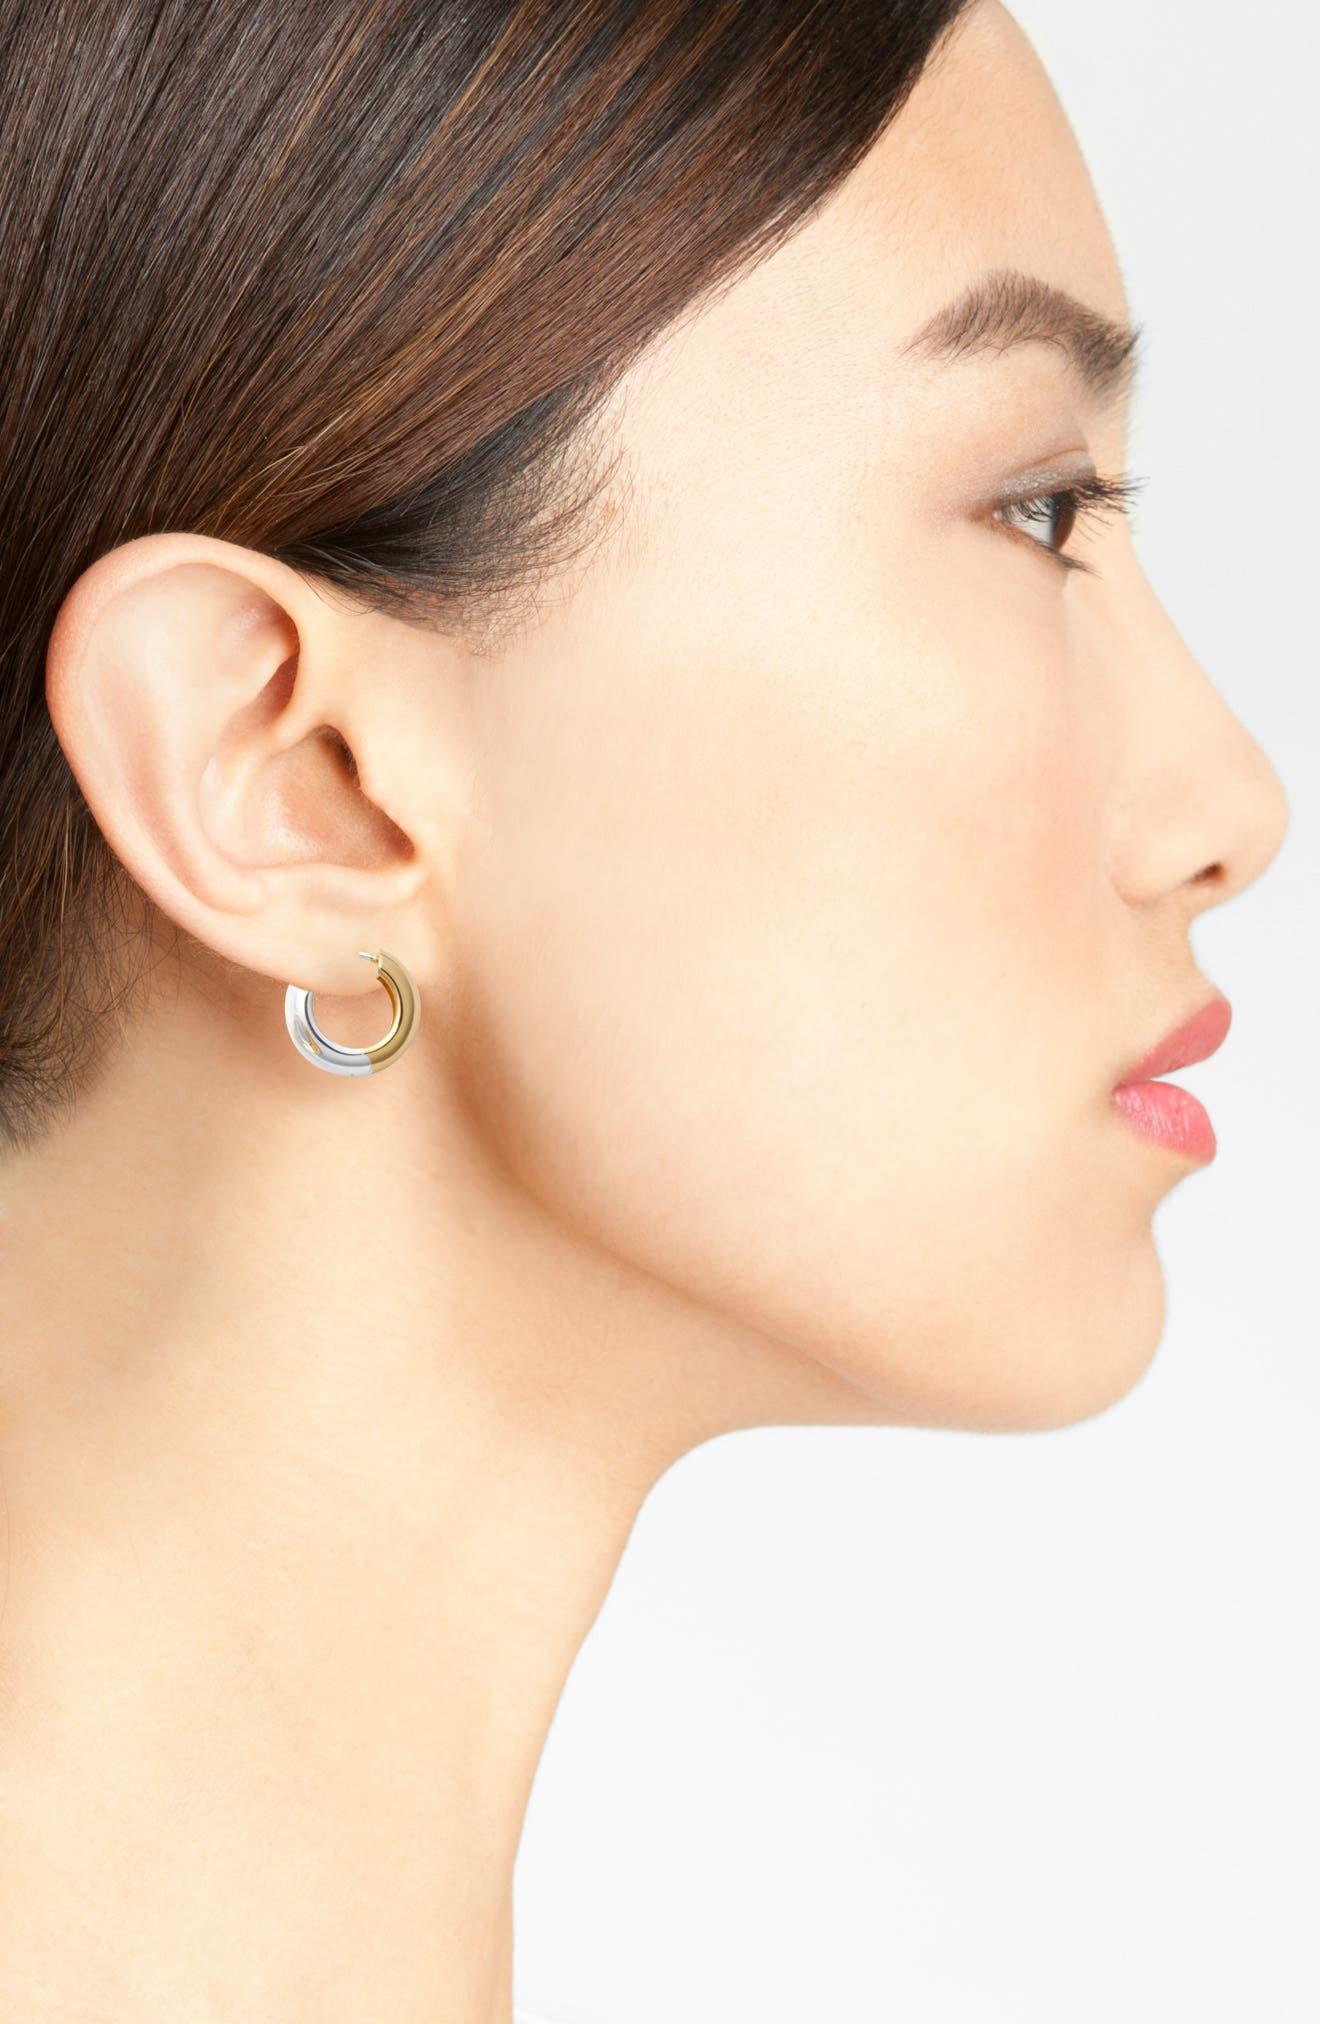 ARGENTO VIVO, Reversible Two-Tone Hoop Earrings, Alternate thumbnail 2, color, SILVER/ GOLD